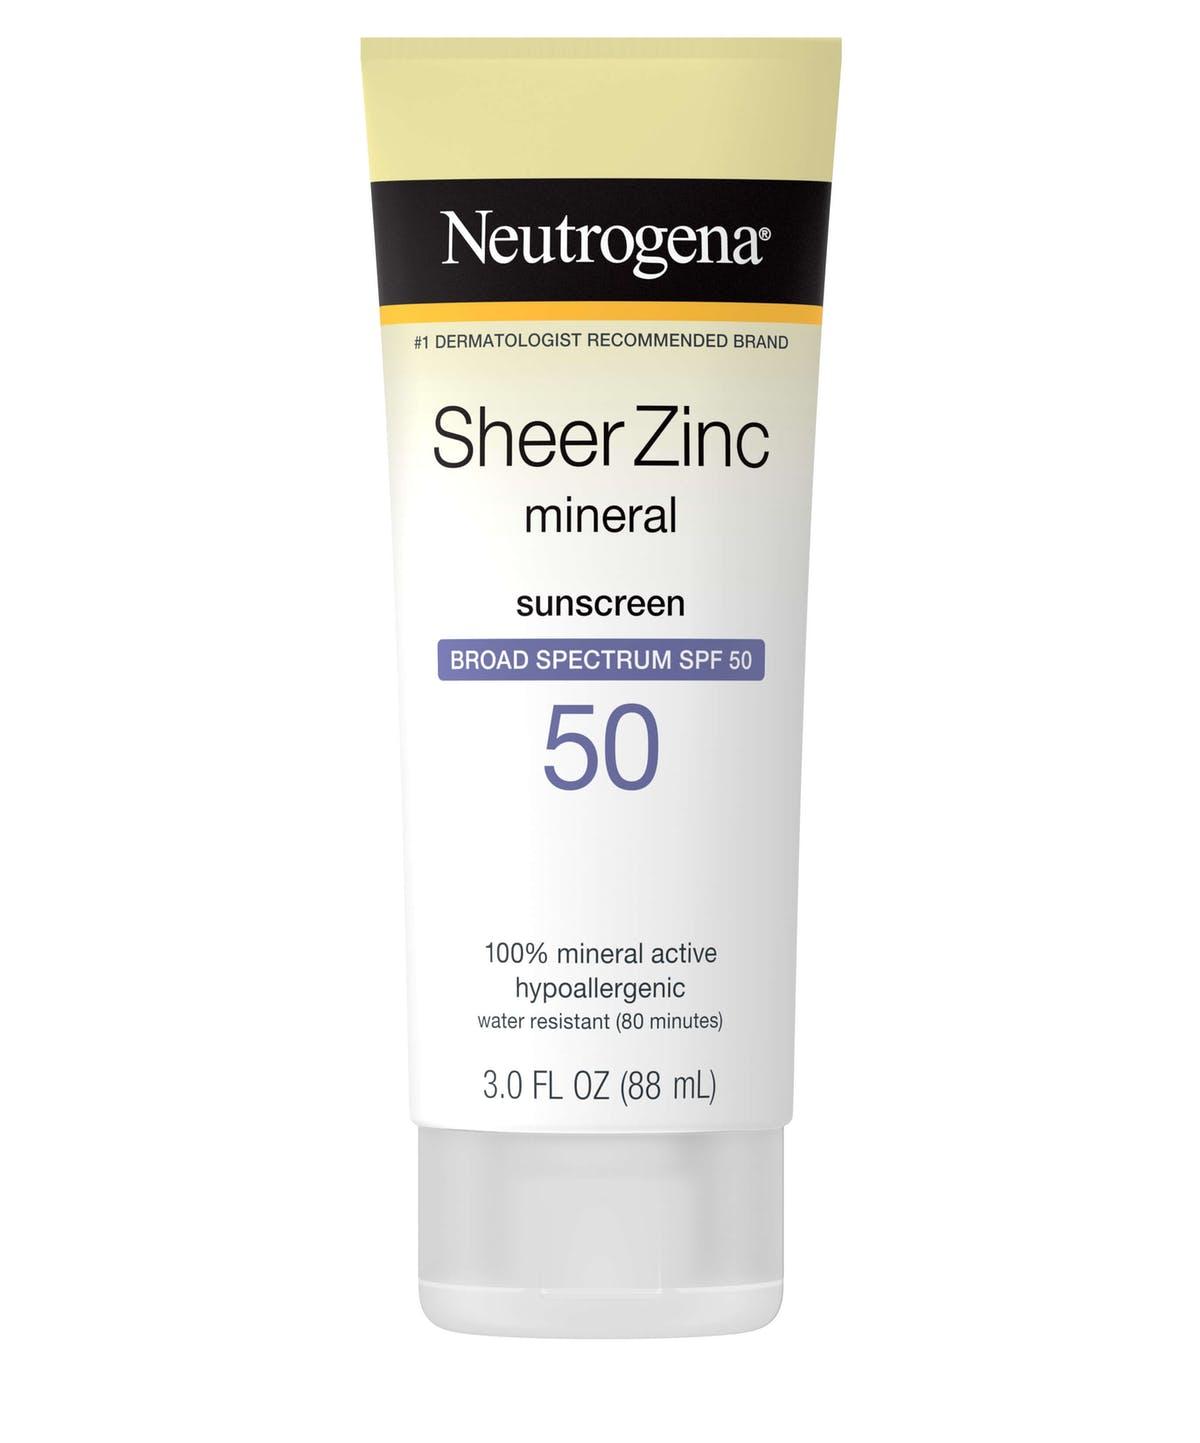 sunscreen indoors - nuetrogena